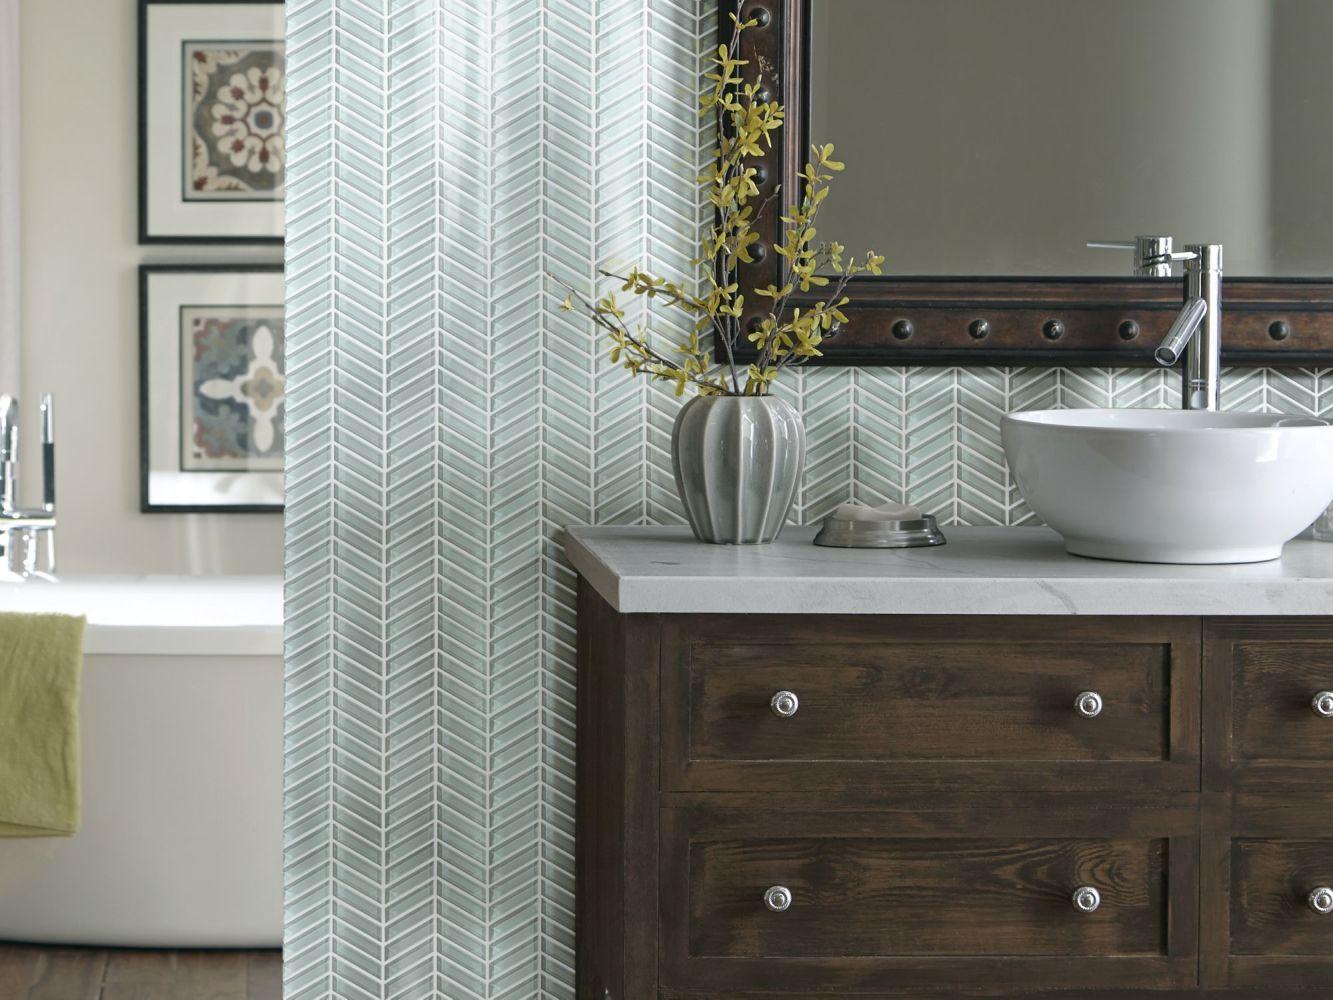 Shaw Floors Home Fn Gold Ceramic Principal Chevron Glass Mo Cloud 00500_TG78B